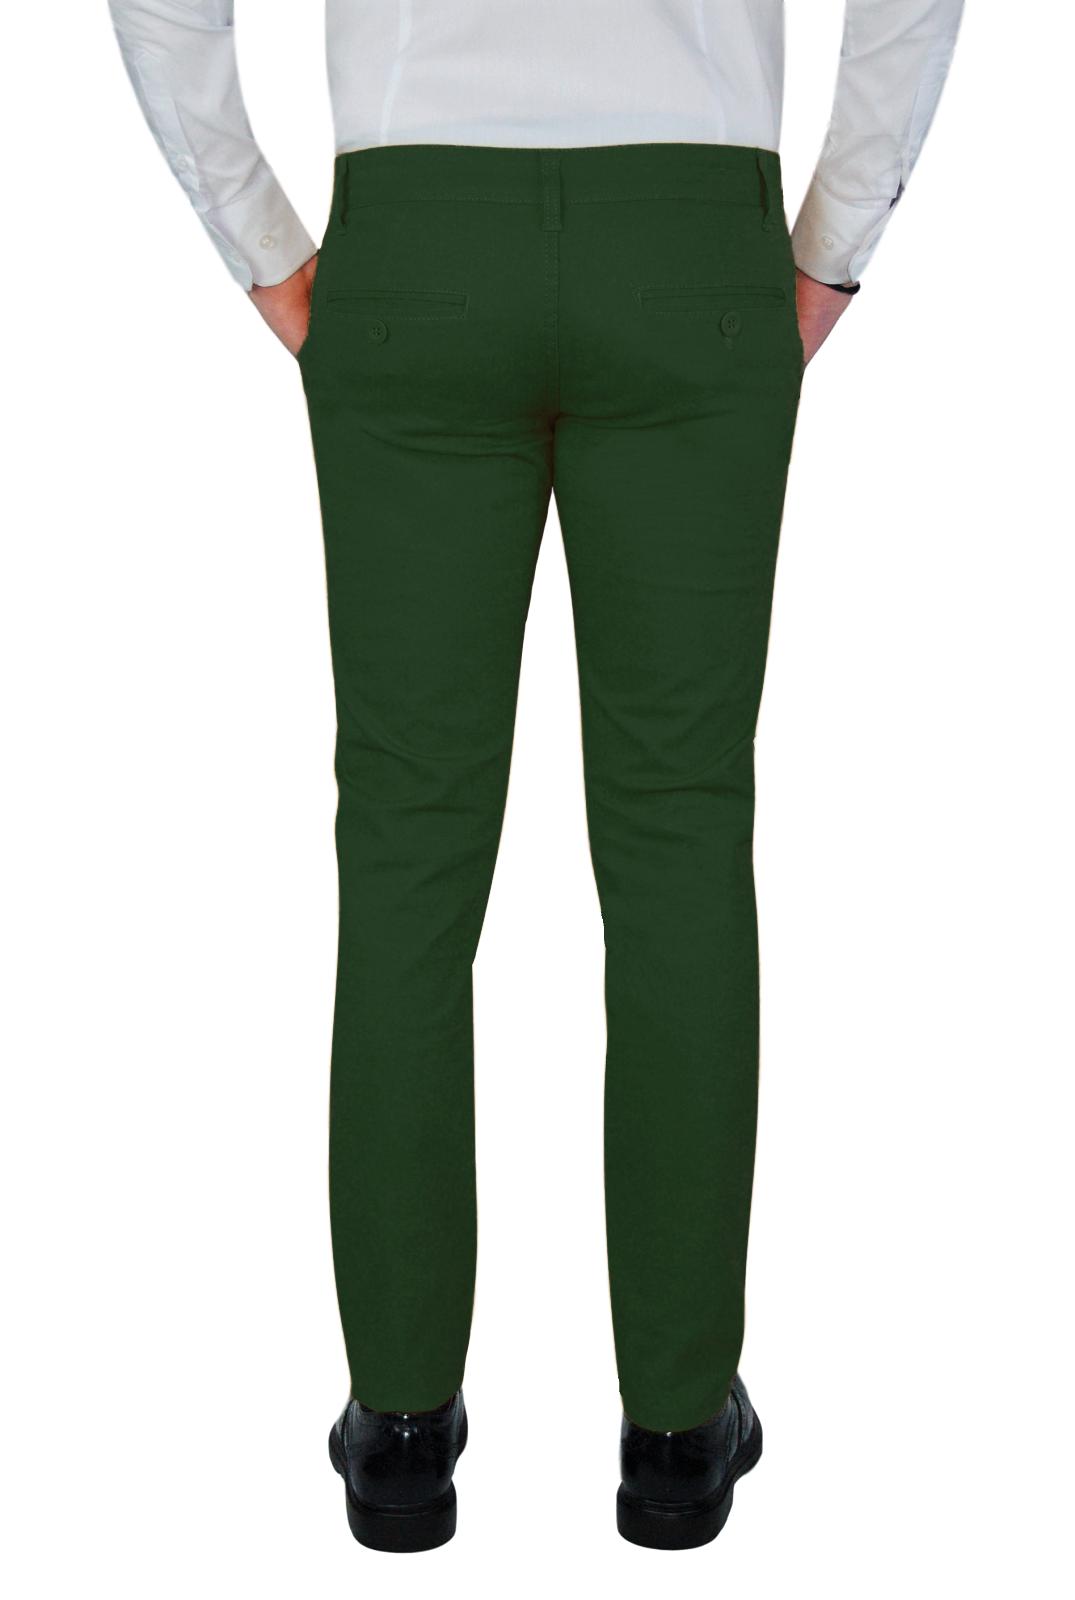 Pantalone-Uomo-Invernale-Slim-Fit-Chino-tasca-america-Cotone-Blu-Nero-Verde miniatura 21